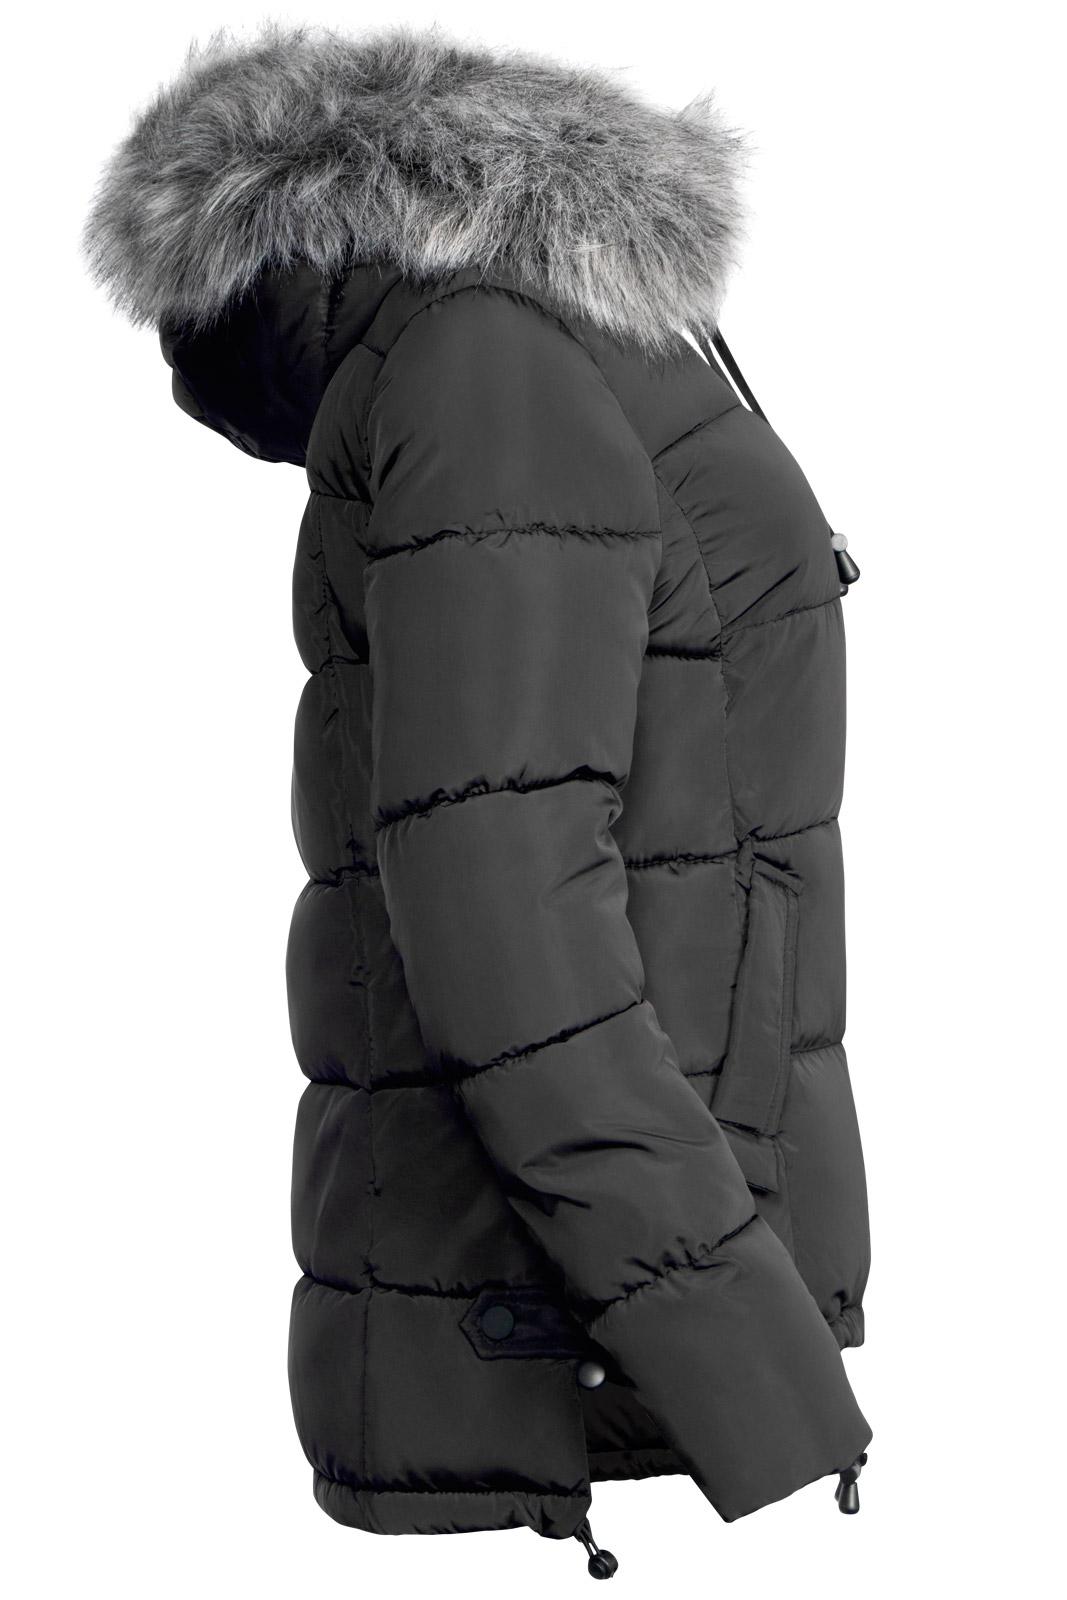 damen winter jacke pelz kapuze kurz mantel ski jacke daunen optik vokuhila ebay. Black Bedroom Furniture Sets. Home Design Ideas